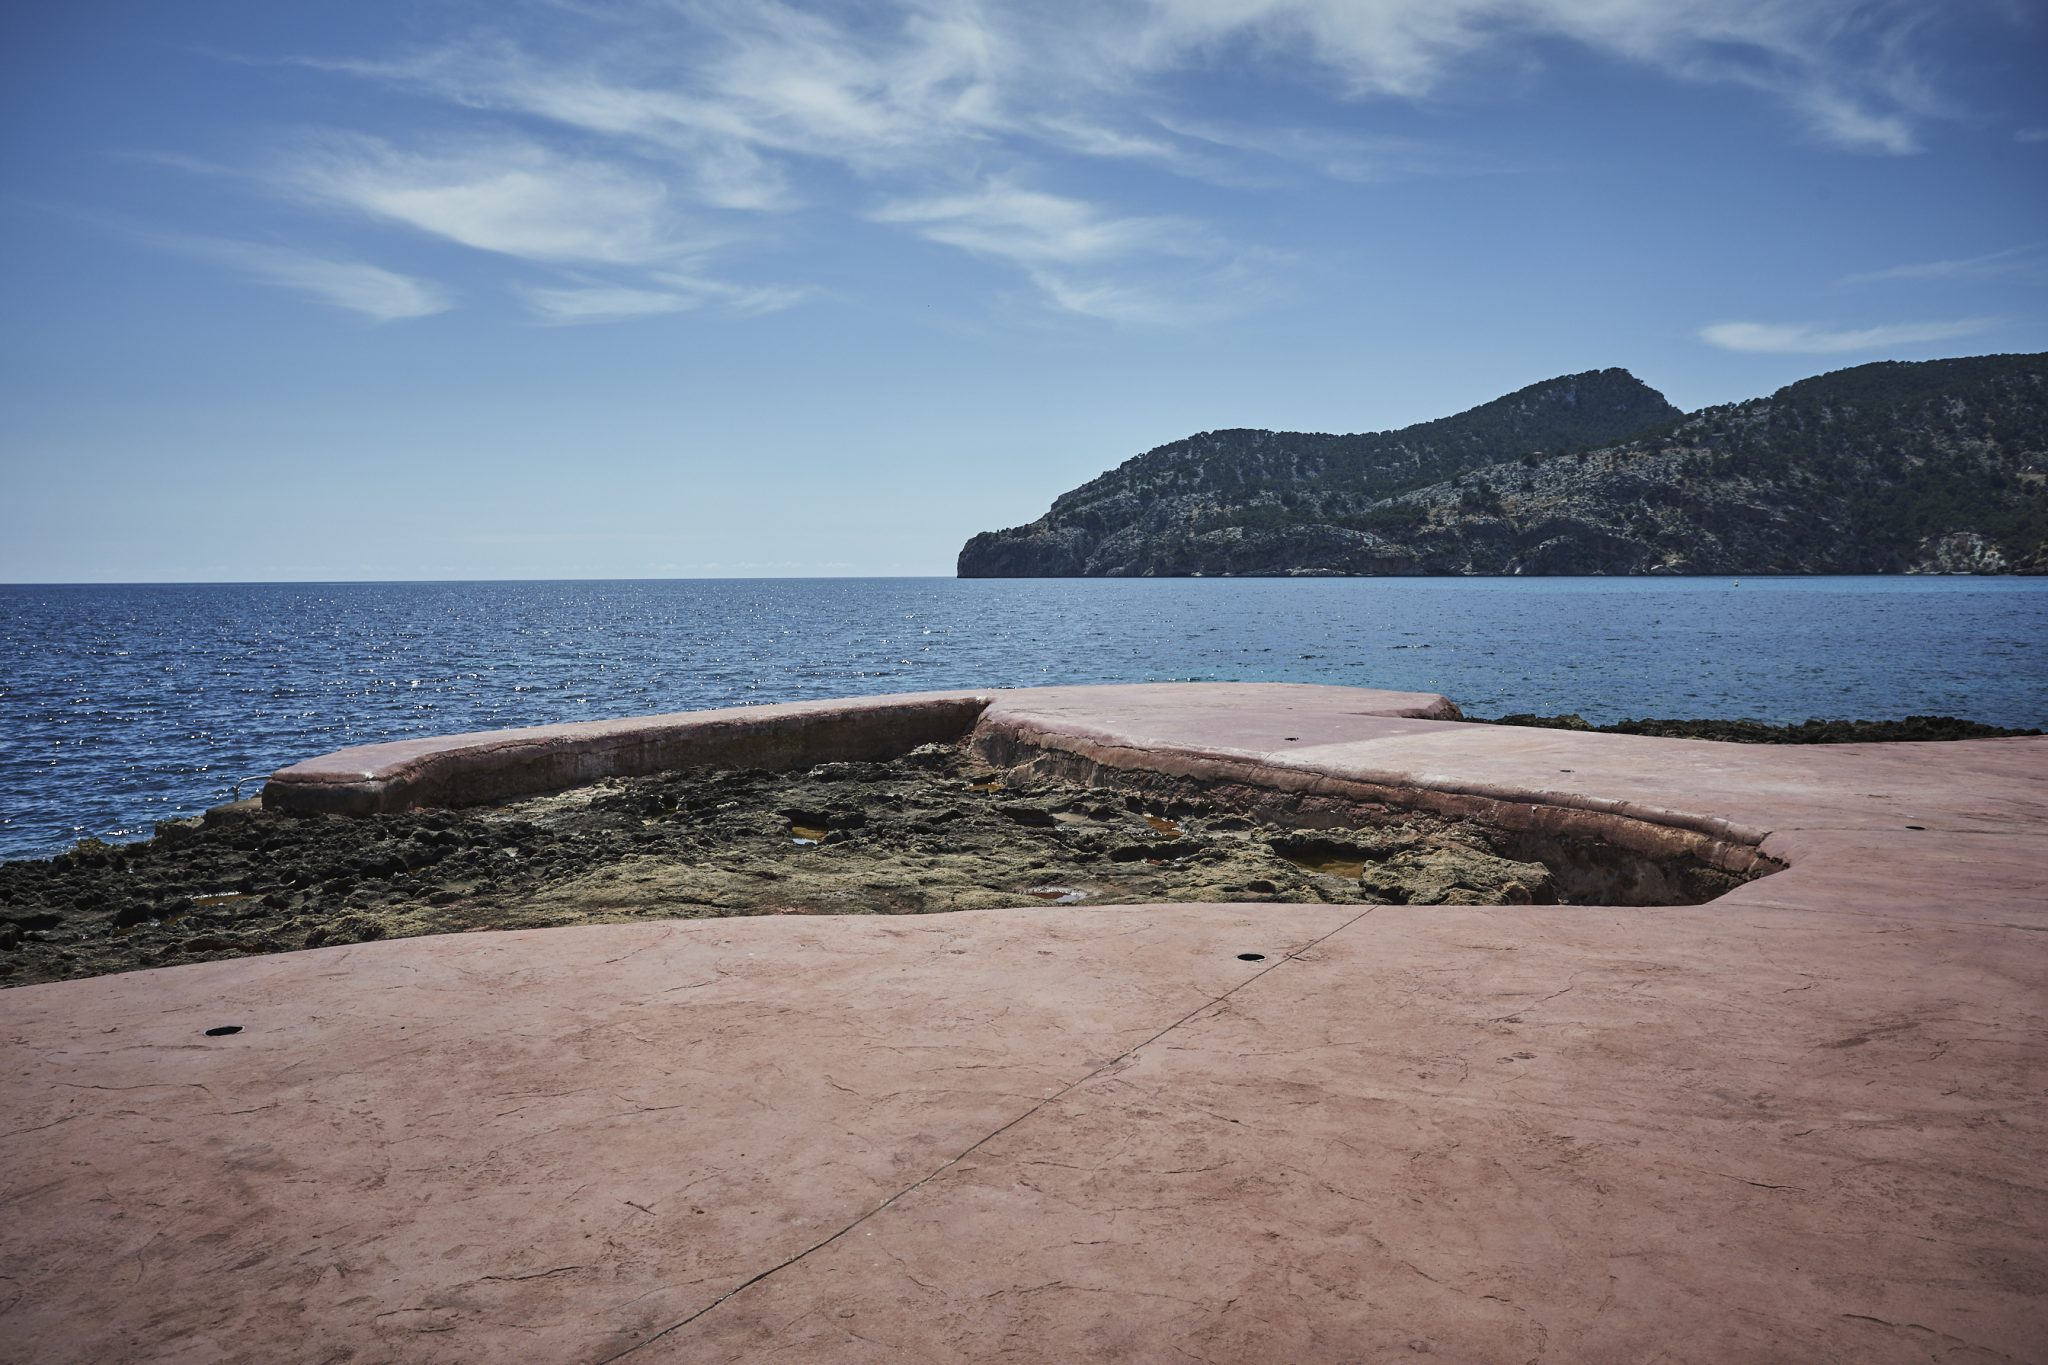 06_RifSpahni_Mallorca Covid_20_A2A0311